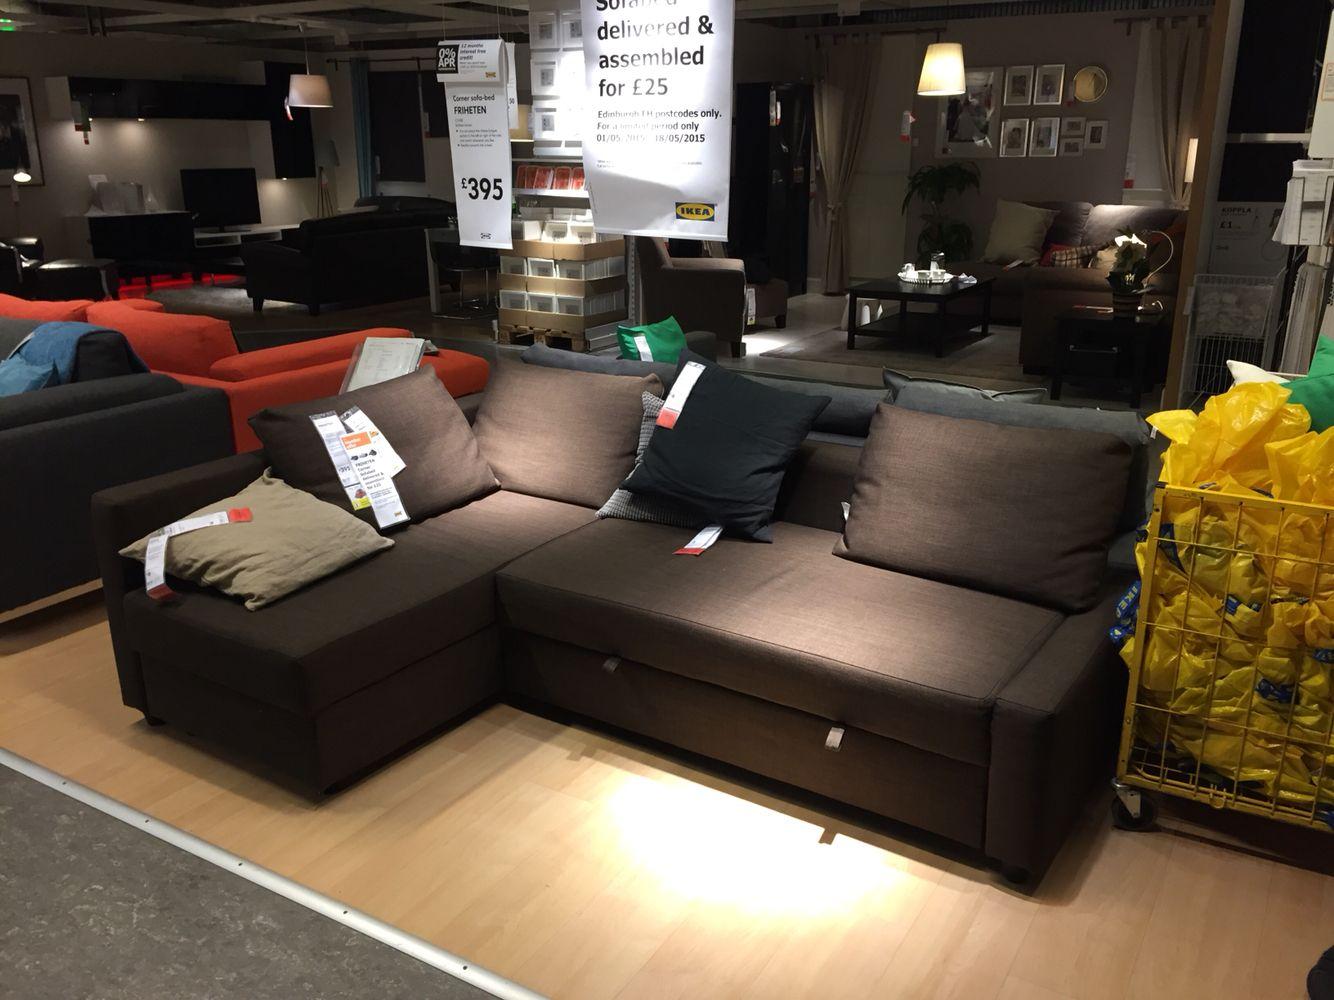 IKEA sofa bed Ikea sofa, Ikea sofa bed, Sofa